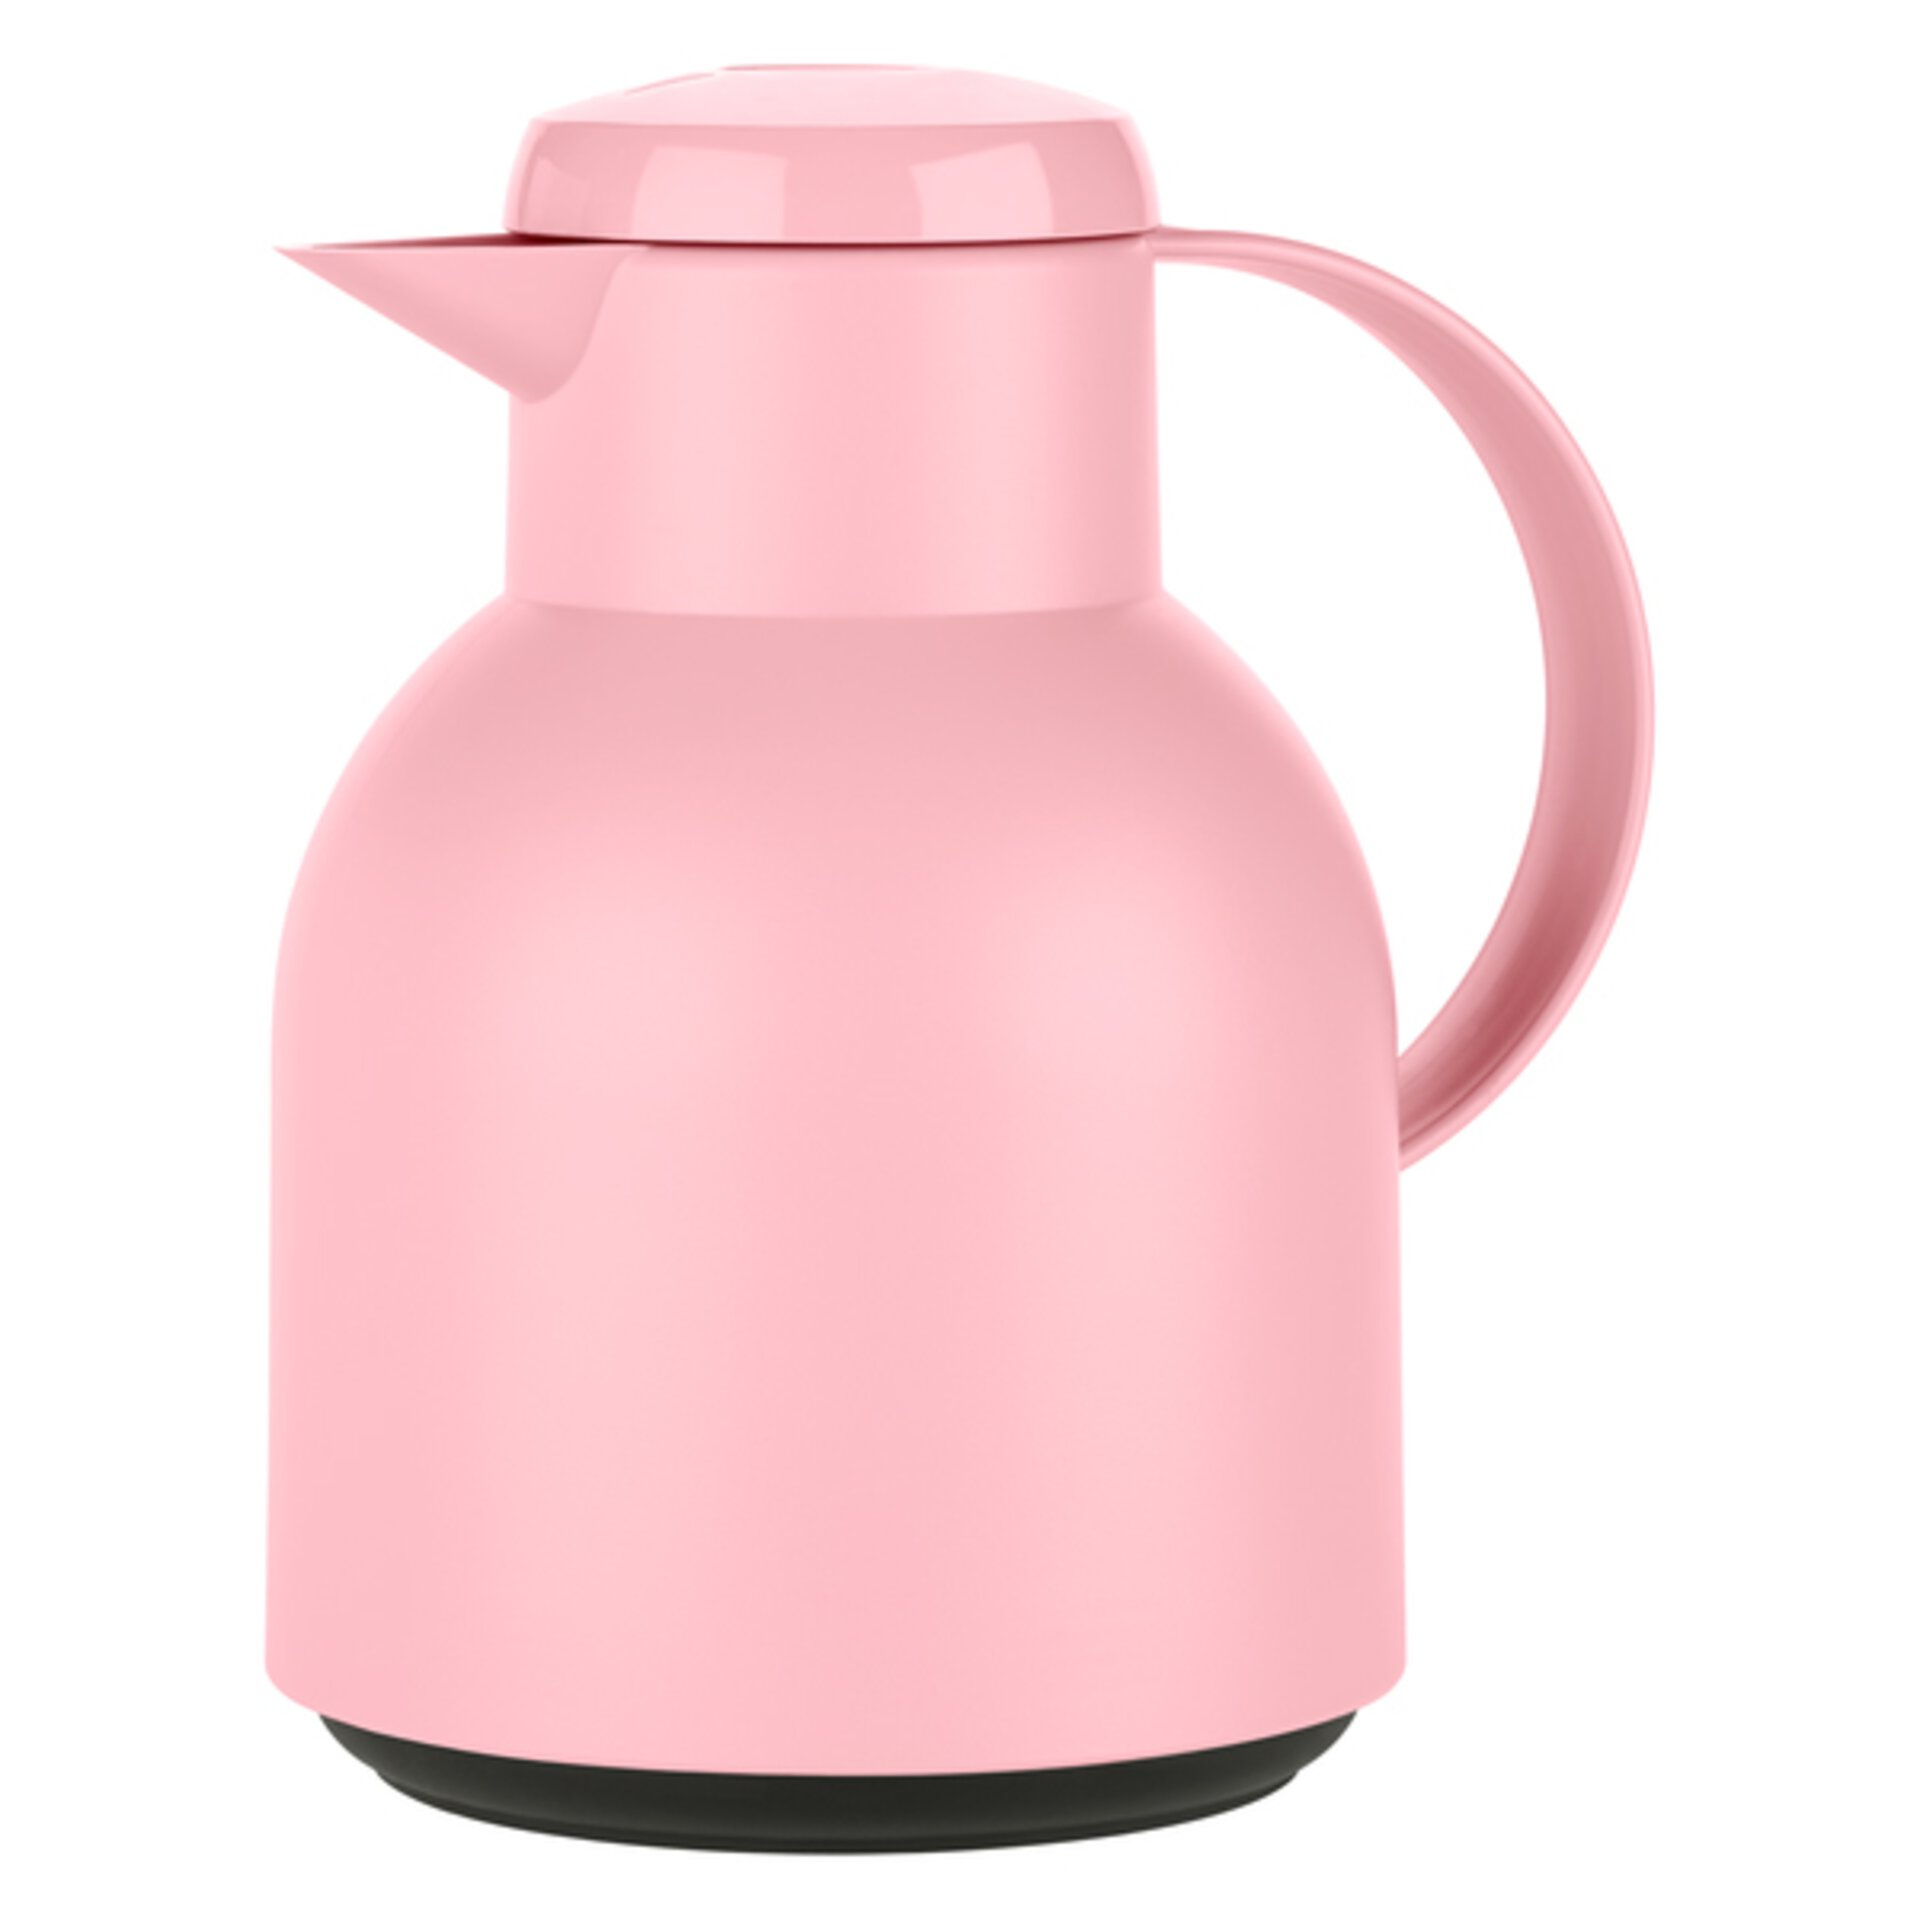 Kanne Samba Emsa Kunststoff rosa